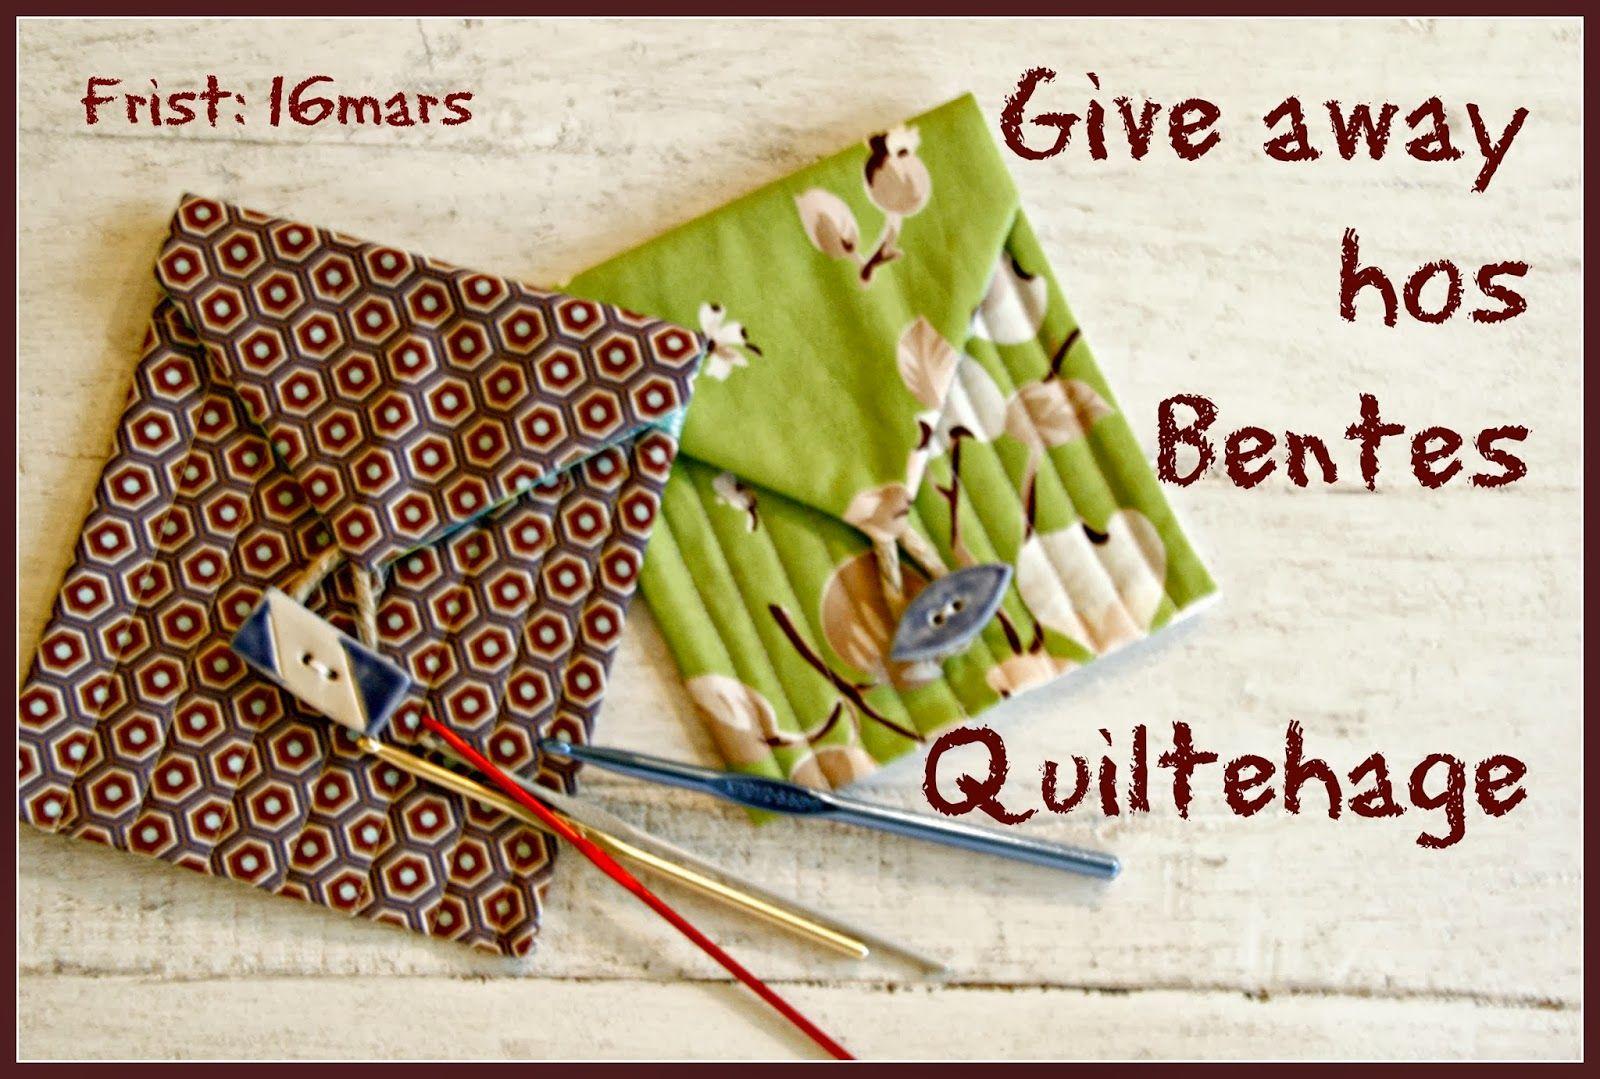 Bentes Quiltehage: Give away !